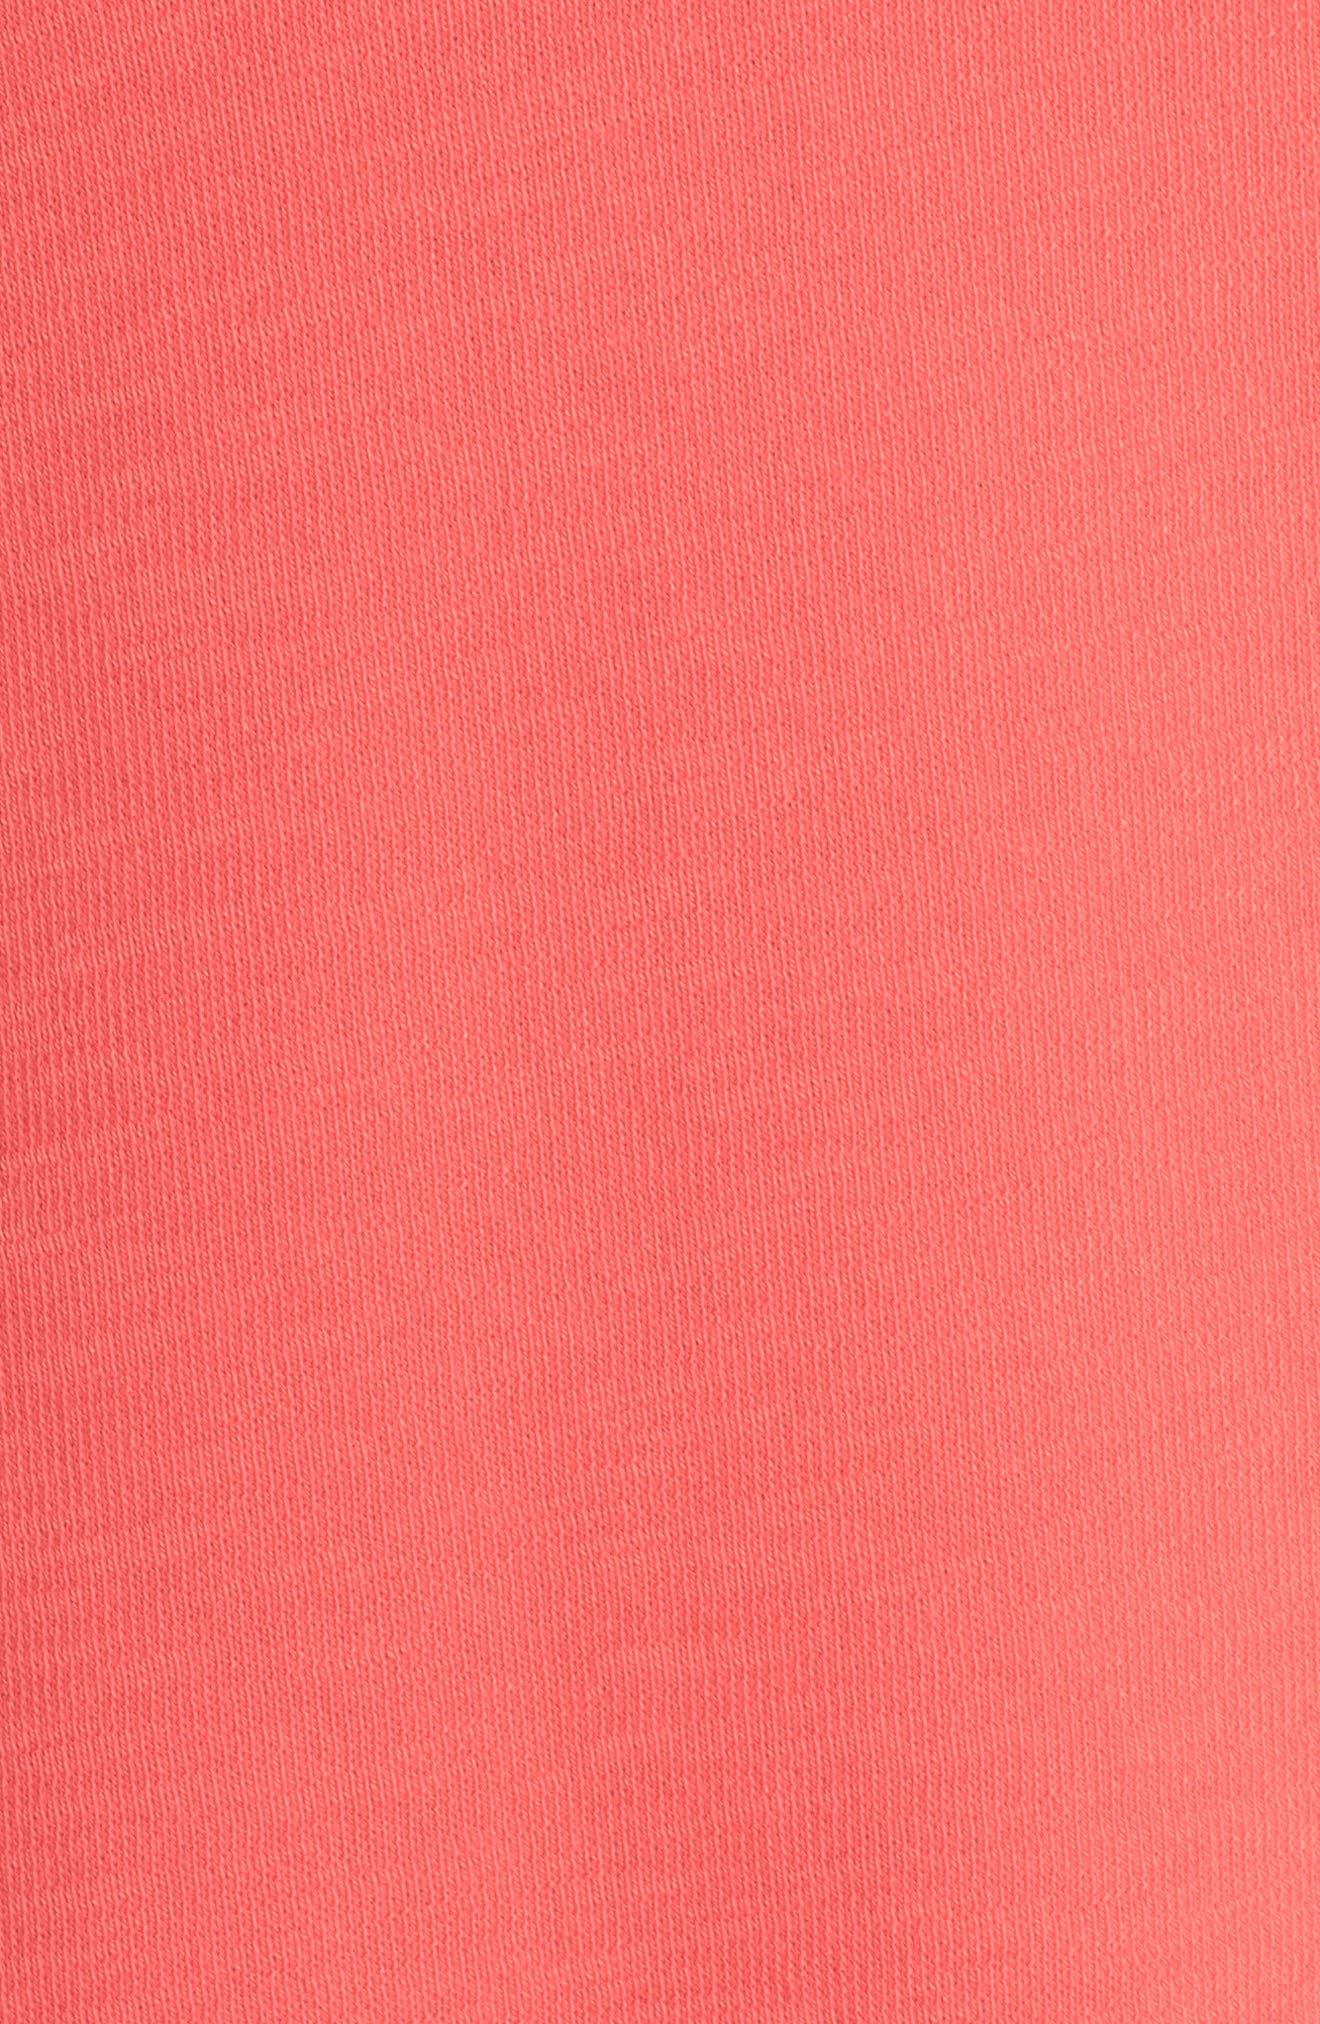 Button Back Knit Dress,                             Alternate thumbnail 6, color,                             Coral Rose